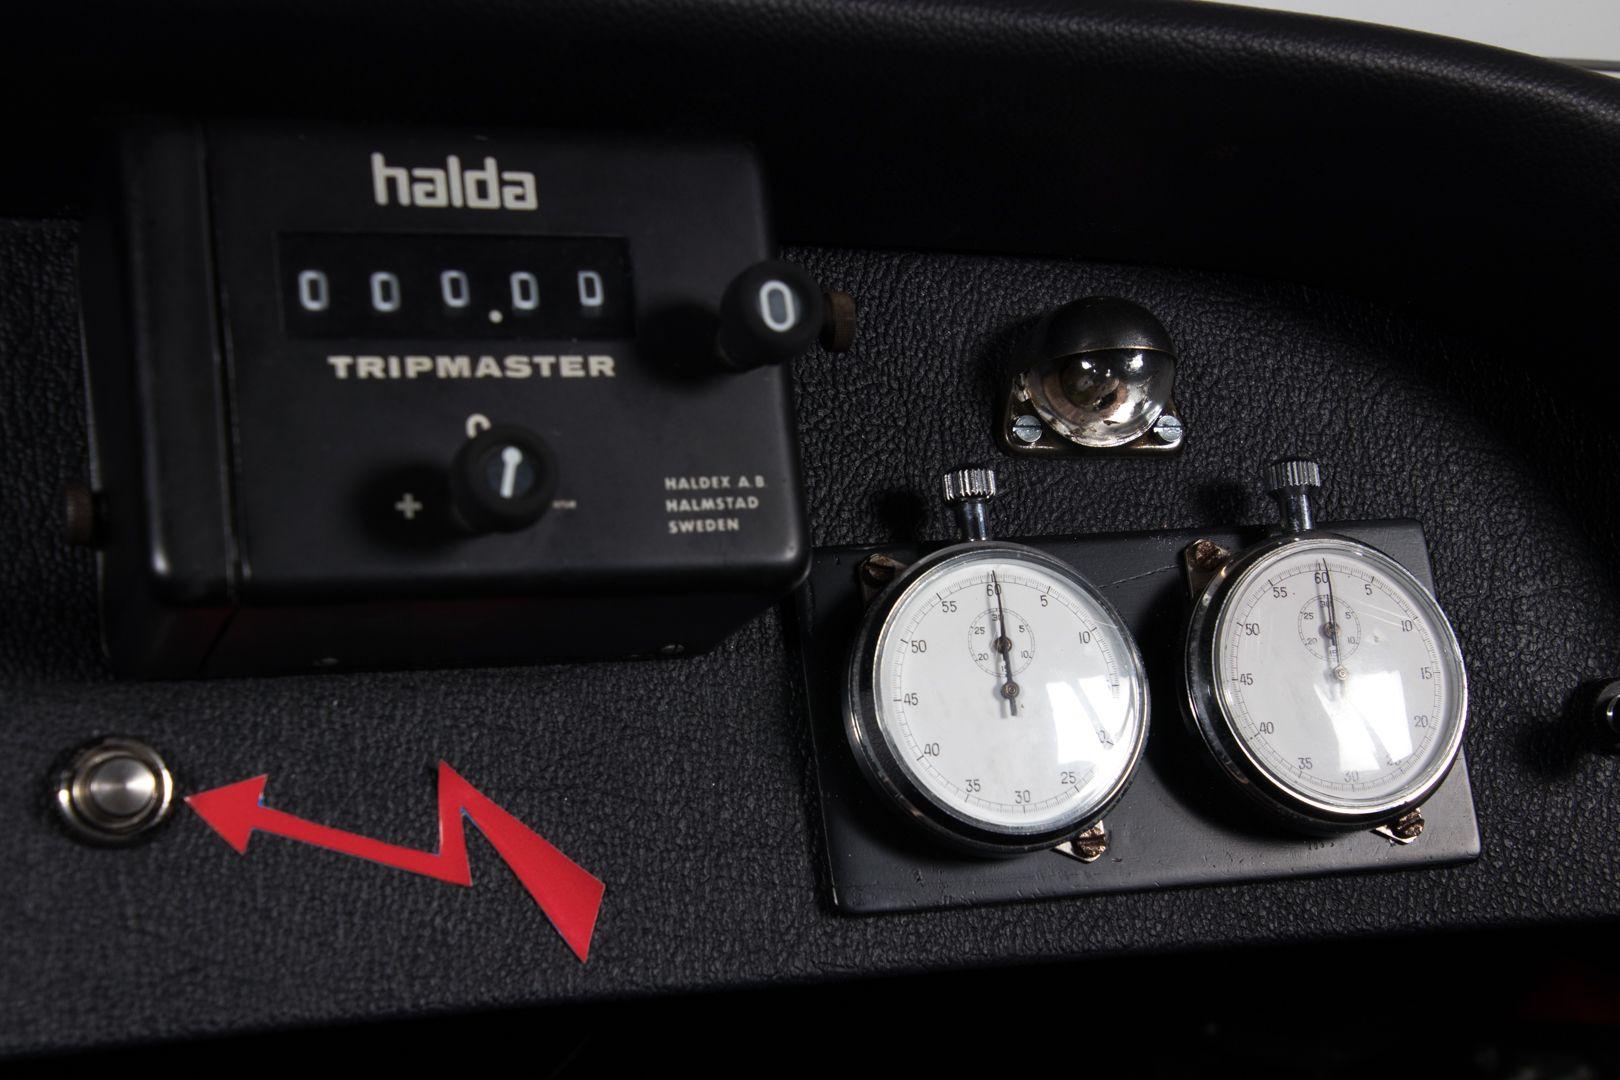 1970 Lancia Fulvia HF 1.6 - Gruppo 4 18821